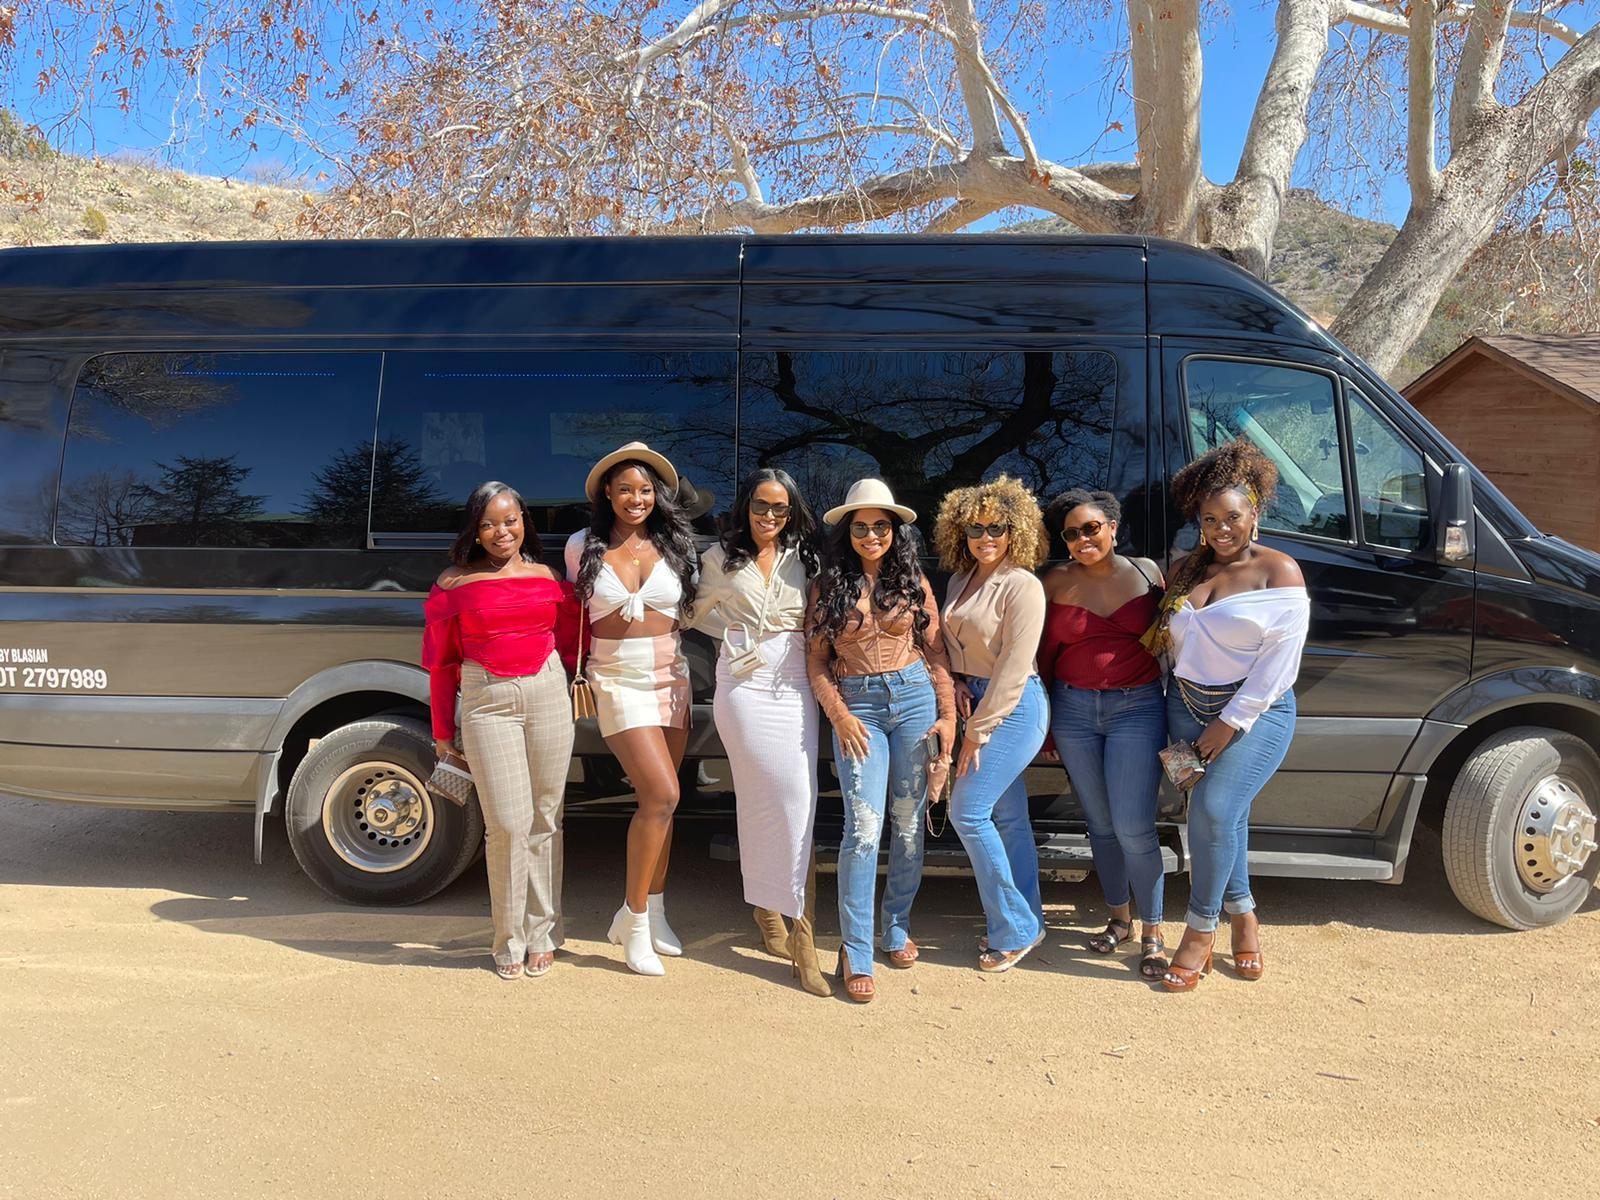 Arizona Wine Tour by Blasian Limousine a